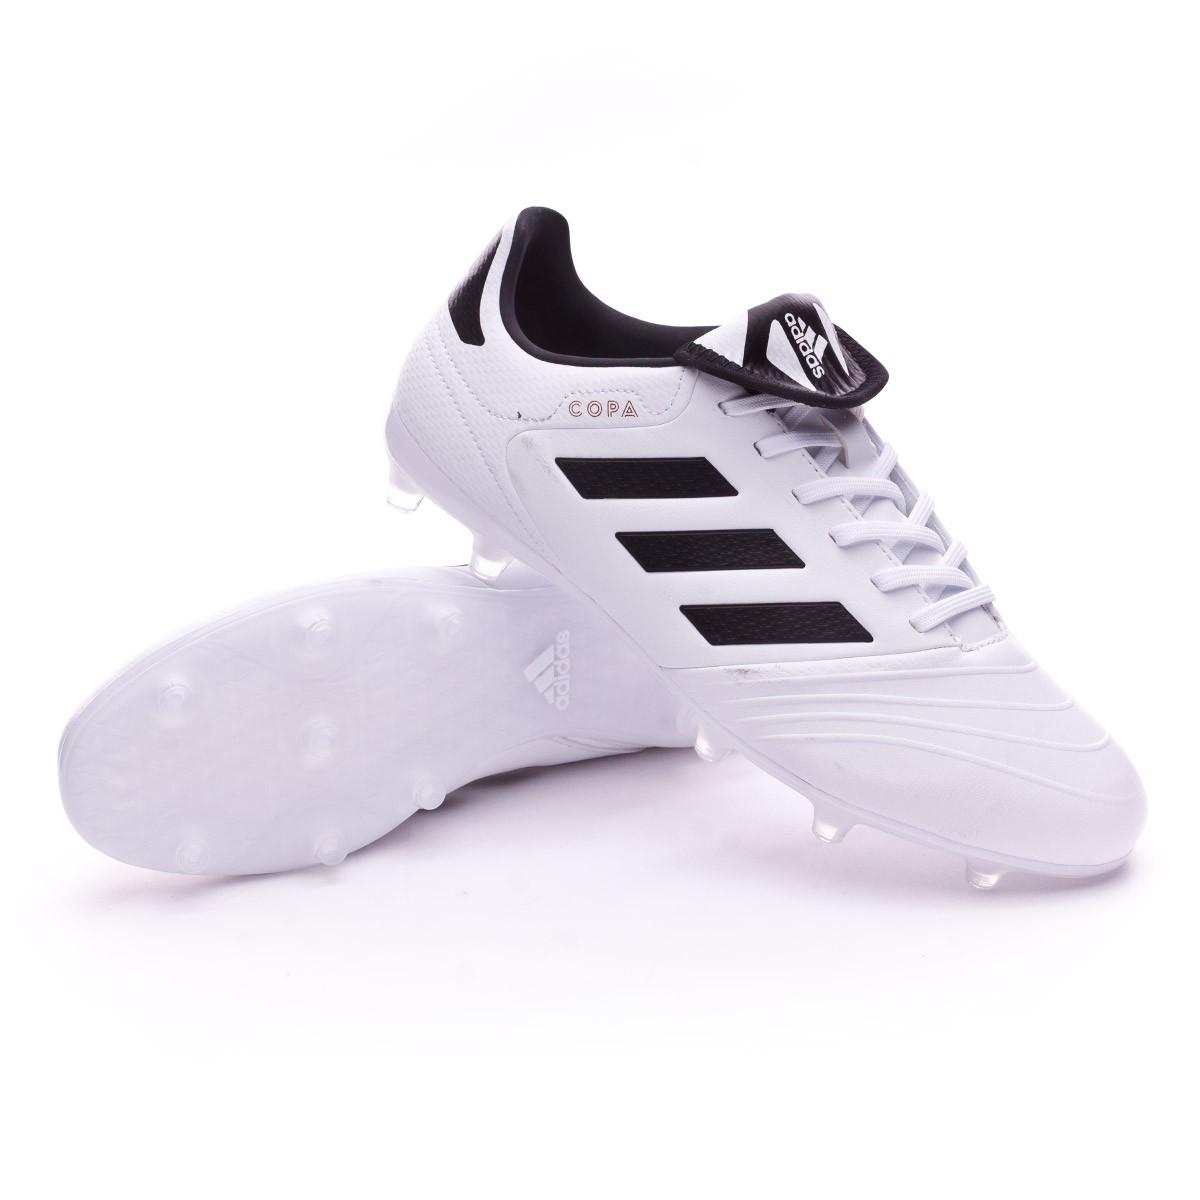 f28a7495a adidas Copa 18.3 FG Football Boots. White-Core black-Tactile gold metallic  ...